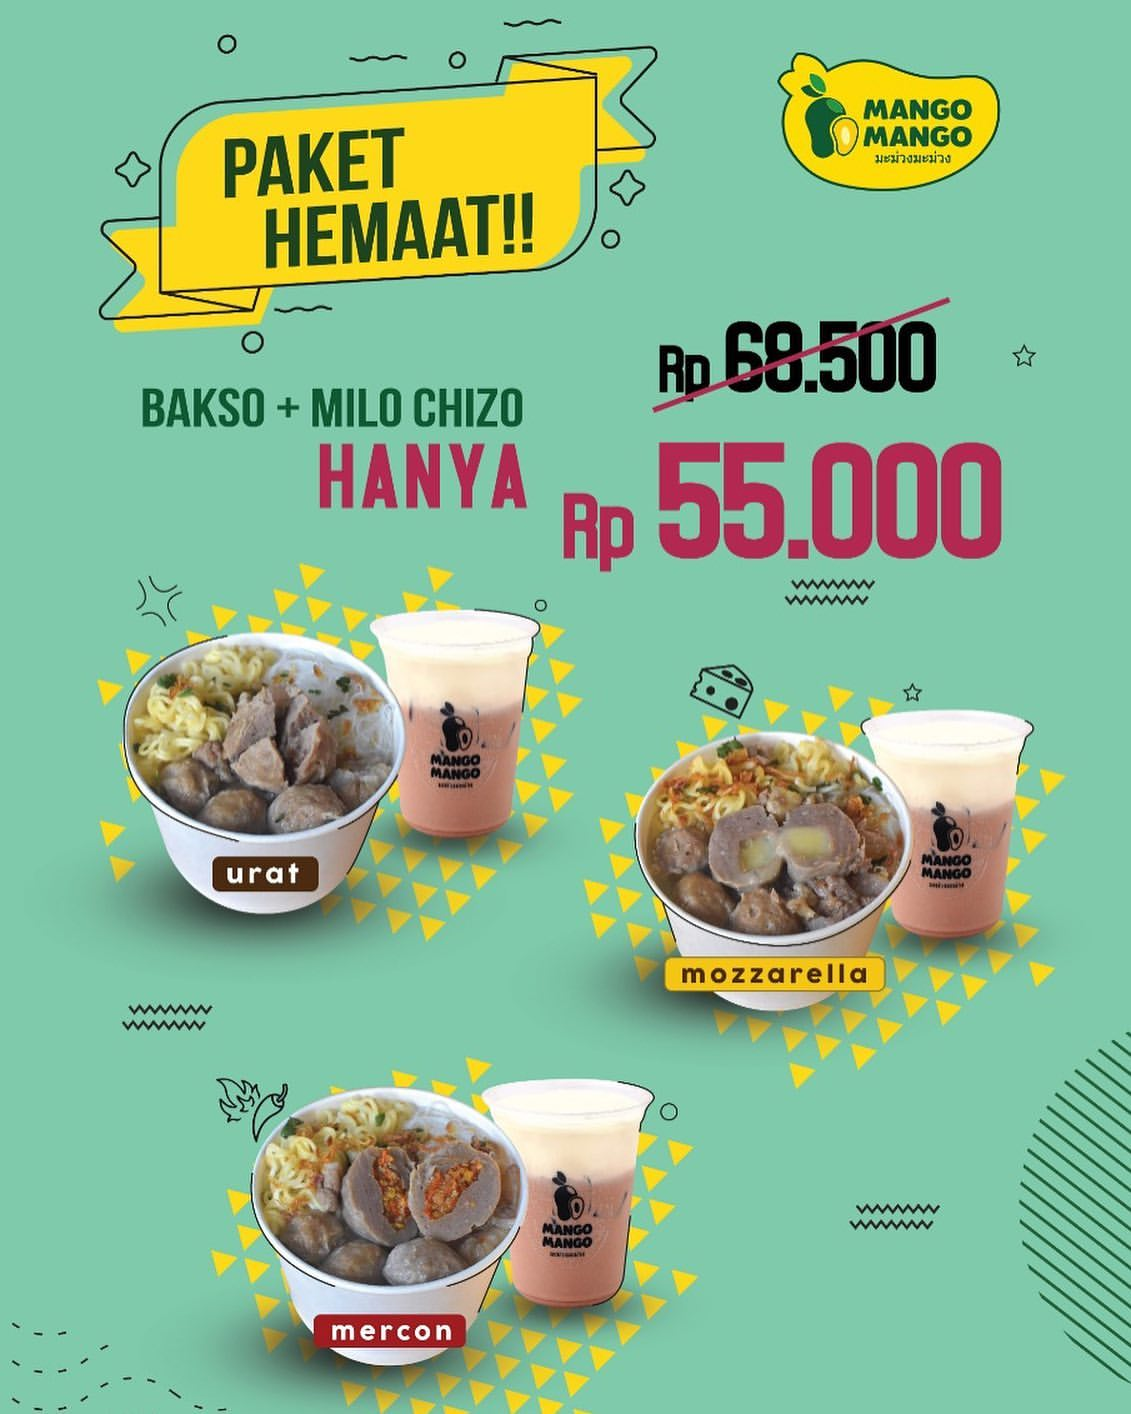 Diskon MANGO MANGO Promo PAKET HEMAT BAKSO + MILO CHIZO Hanya Rp.55.000